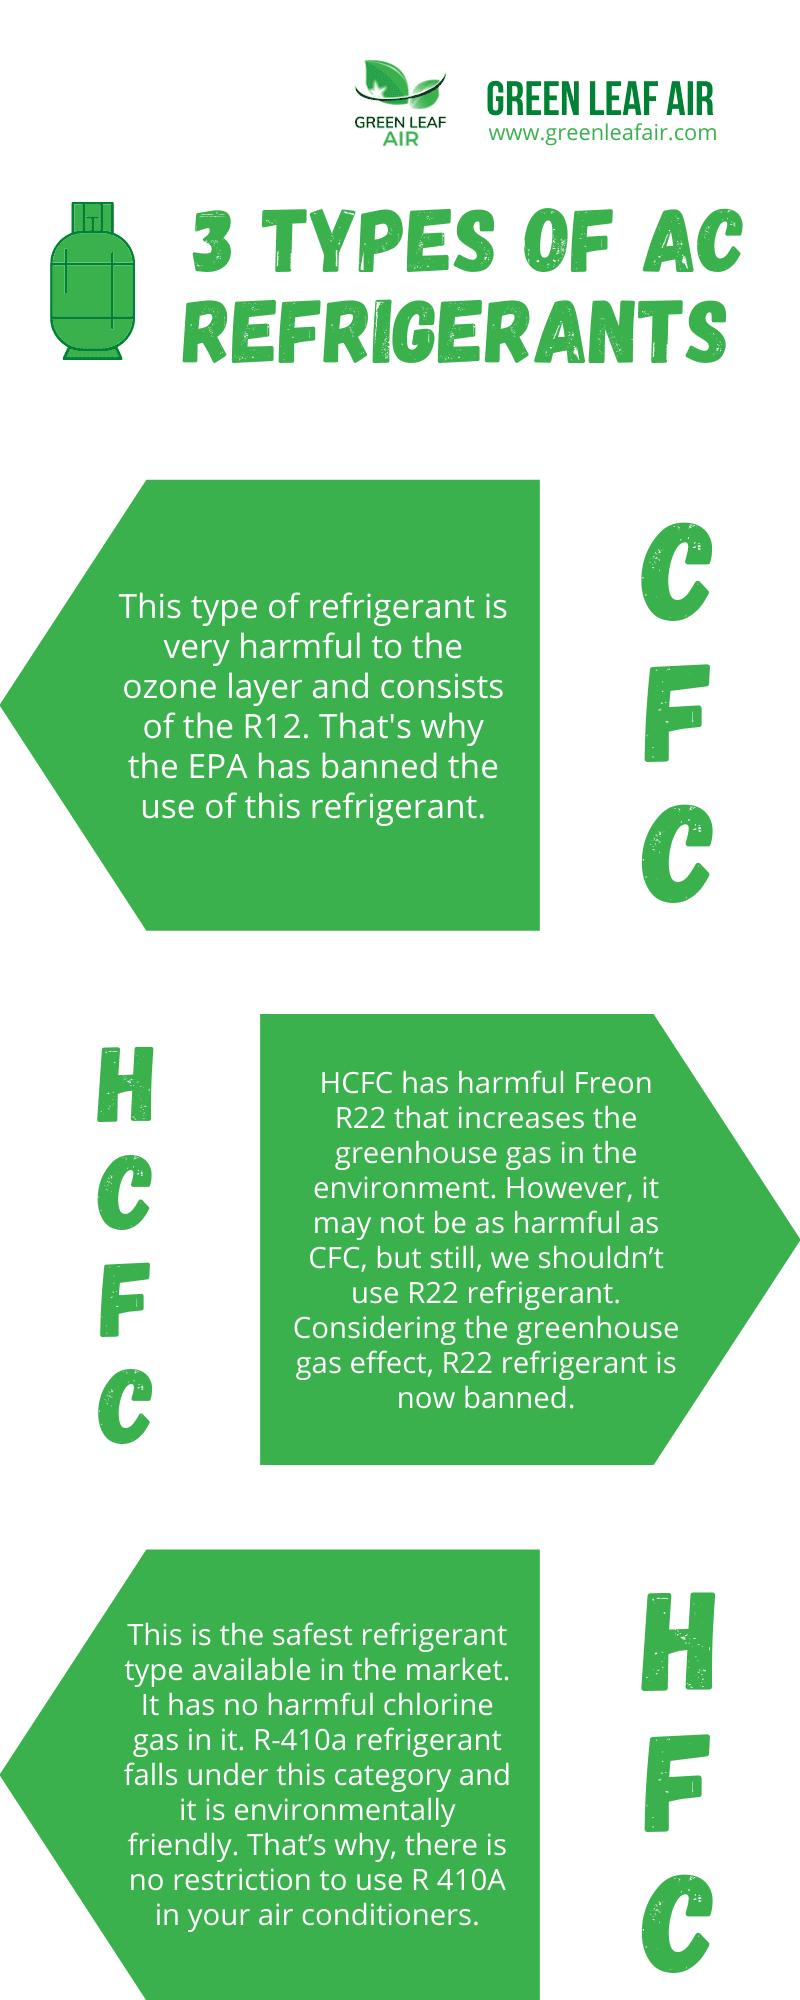 3 Types of AC Refrigerants